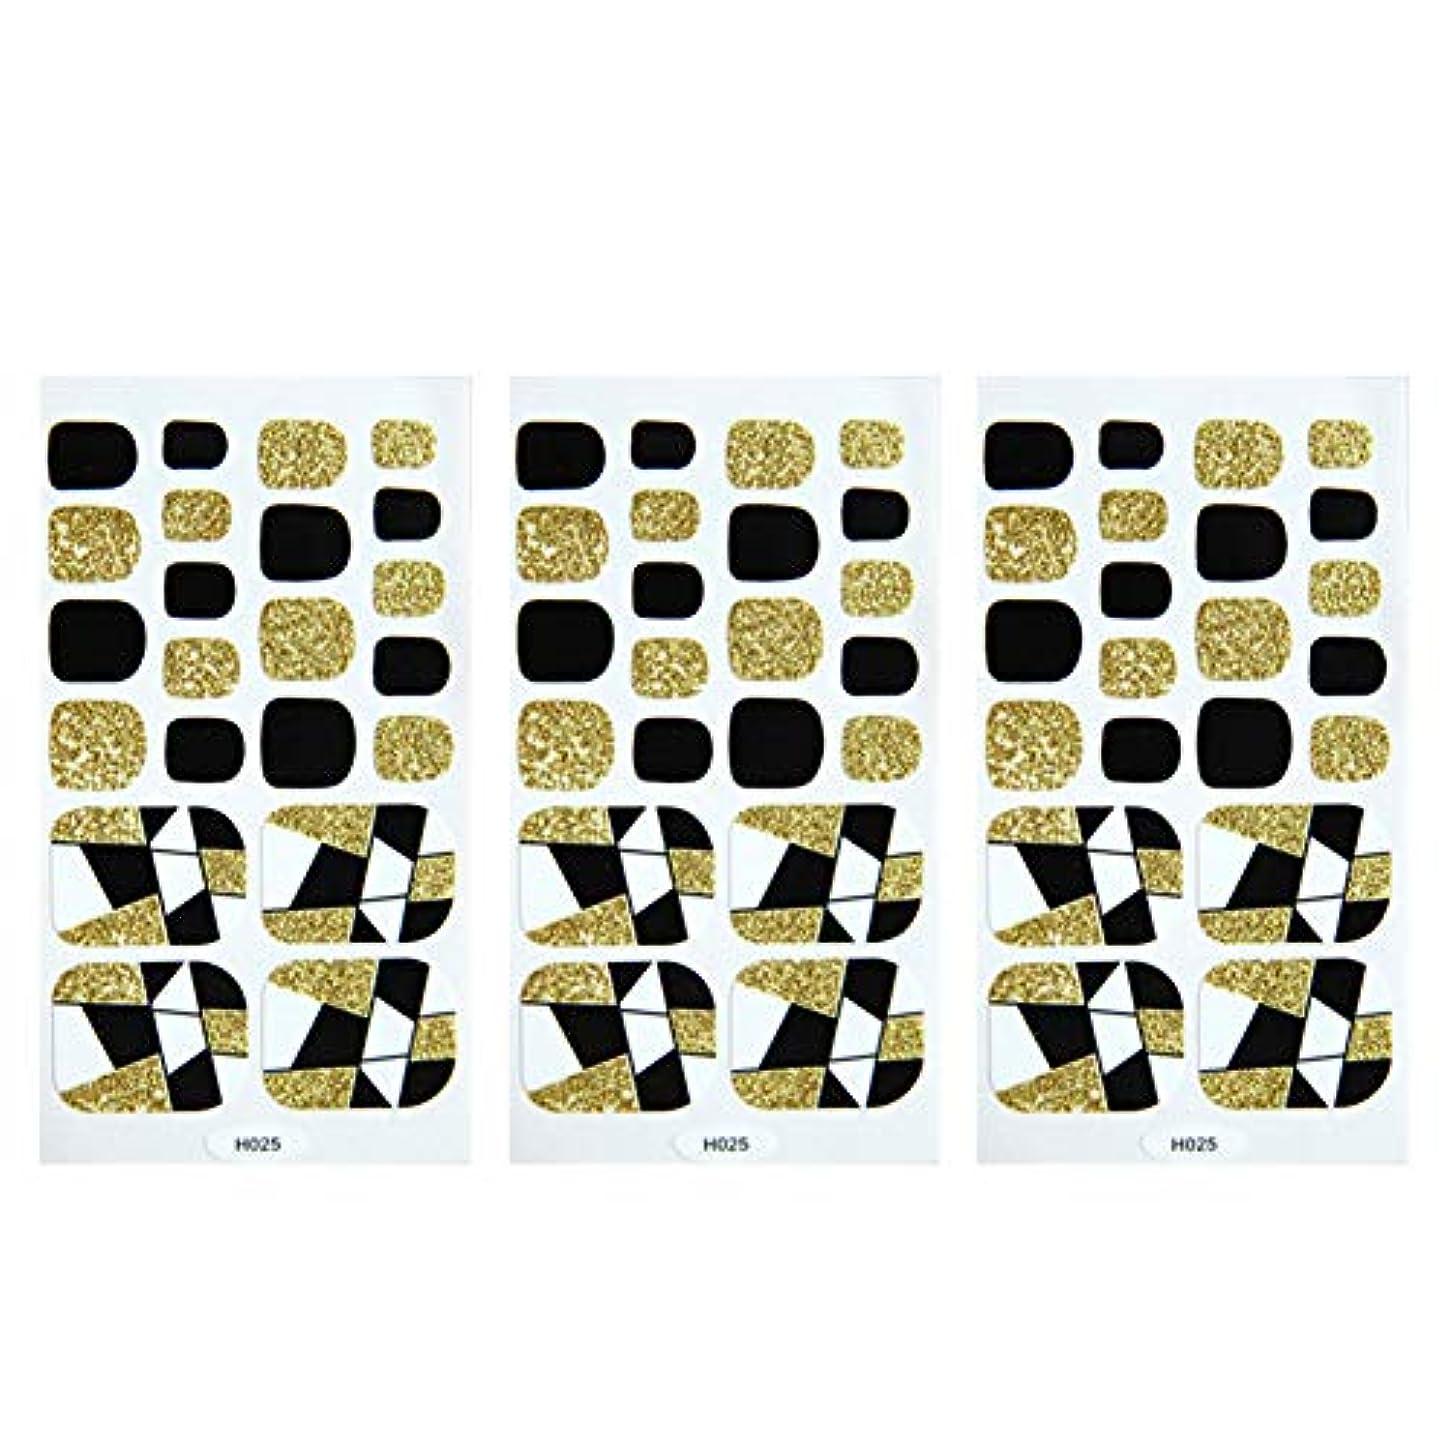 Poonikuuネイルシールステッカー 足爪ネイル ネイルアート ネイルチップ ネイルの飾り 貼るだけアマチュア ネイル好きの女性レディース 人気のあるビューティー美しさ 安全便利無害無毒 3枚セット ゴルード